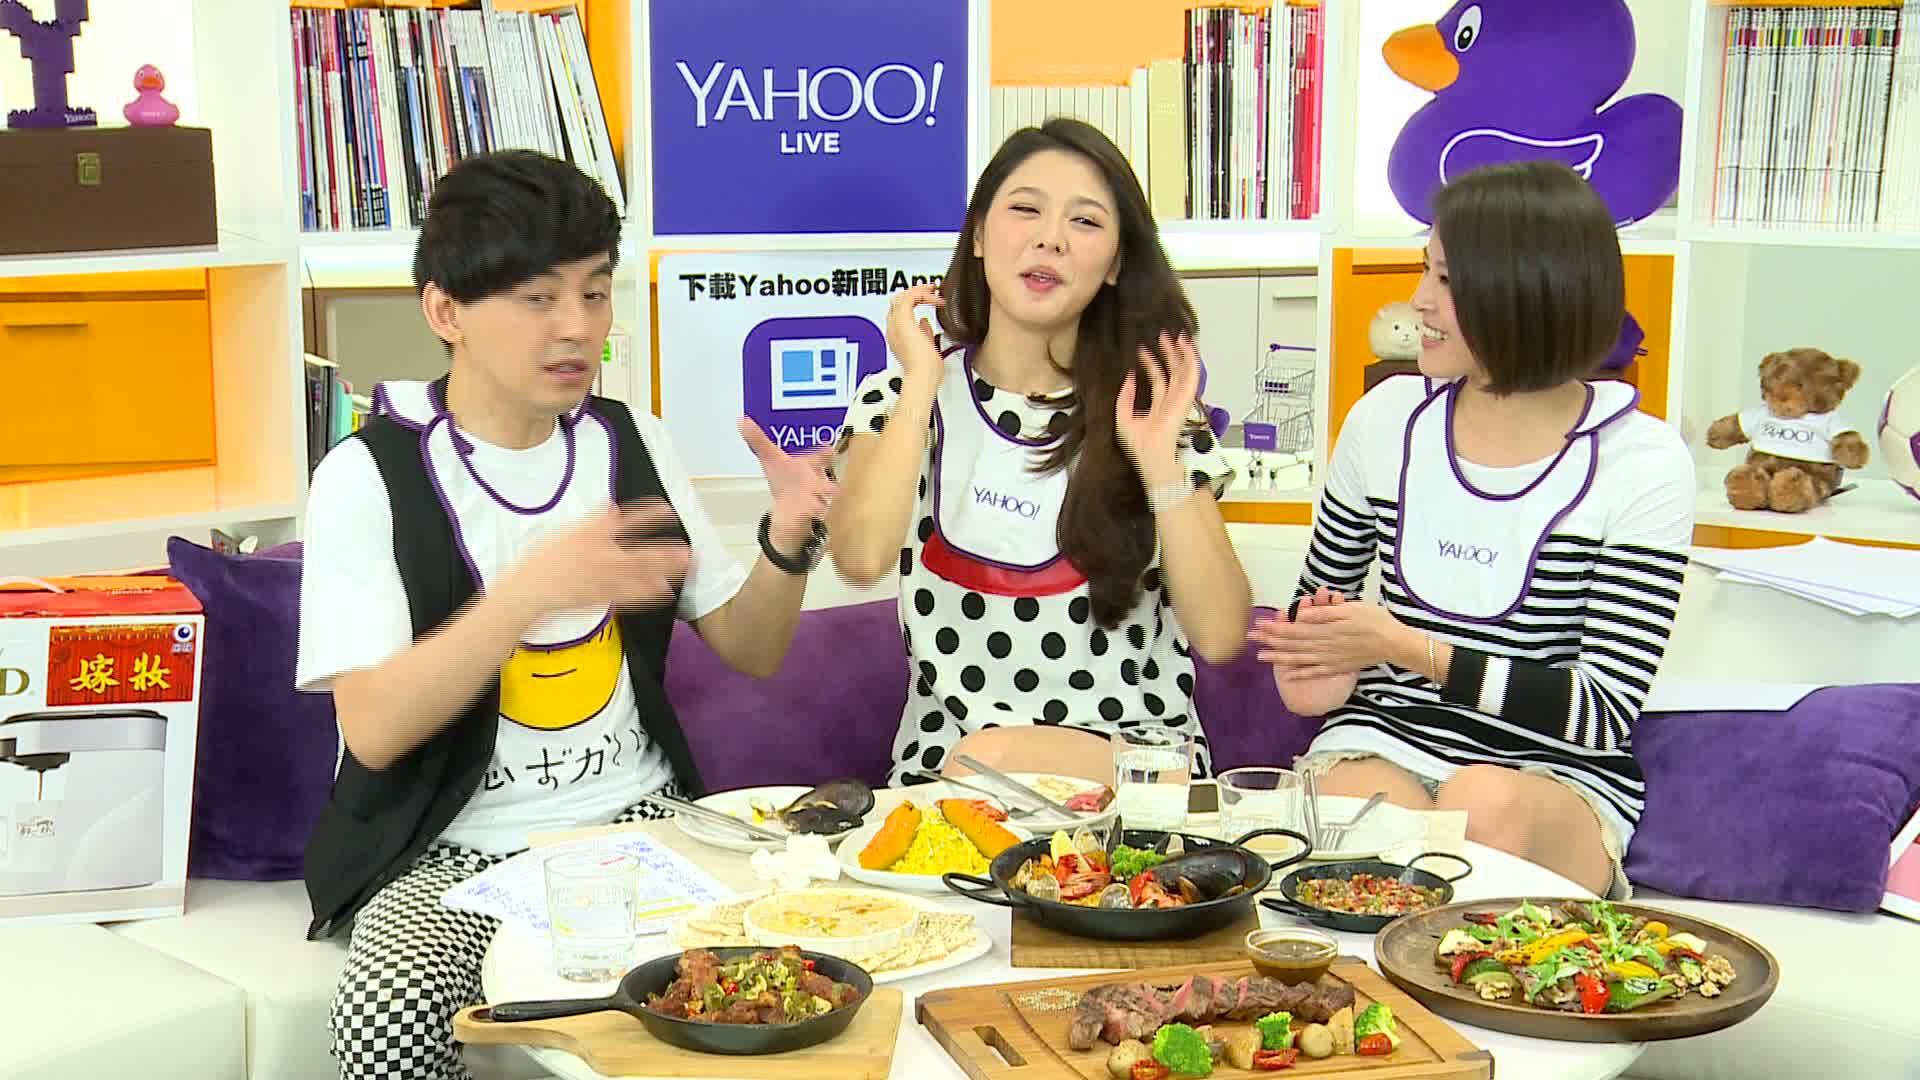 【Yahoo LIVE】嫁妝:白家綺在印尼擁高人氣 連印尼話也會說